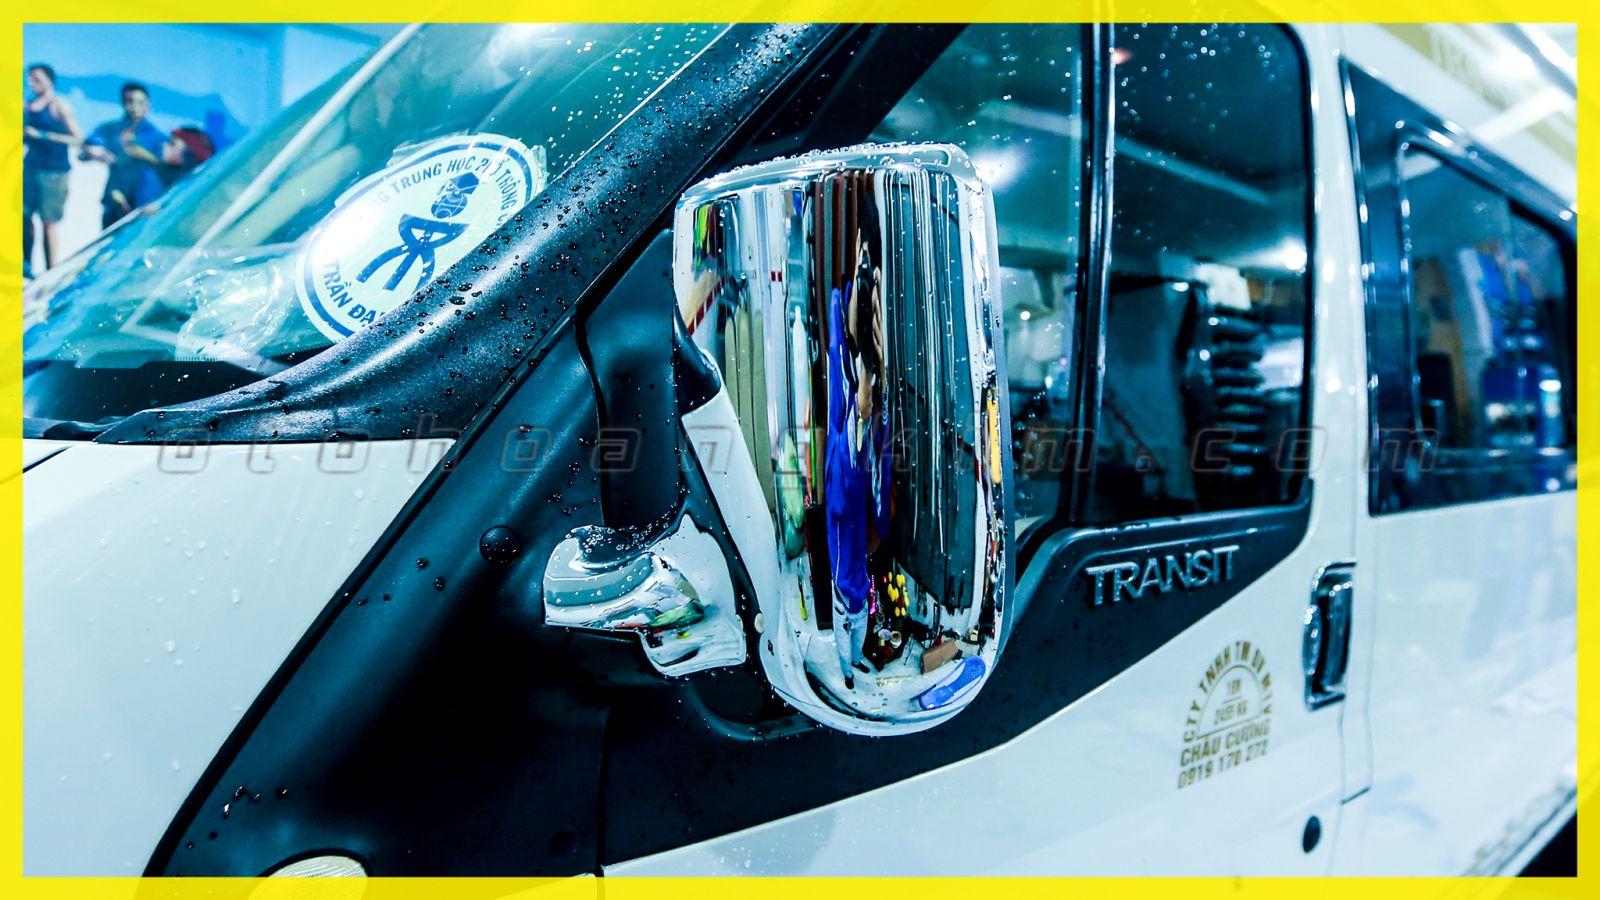 Ốp gương chiếu hậu Ford Transit